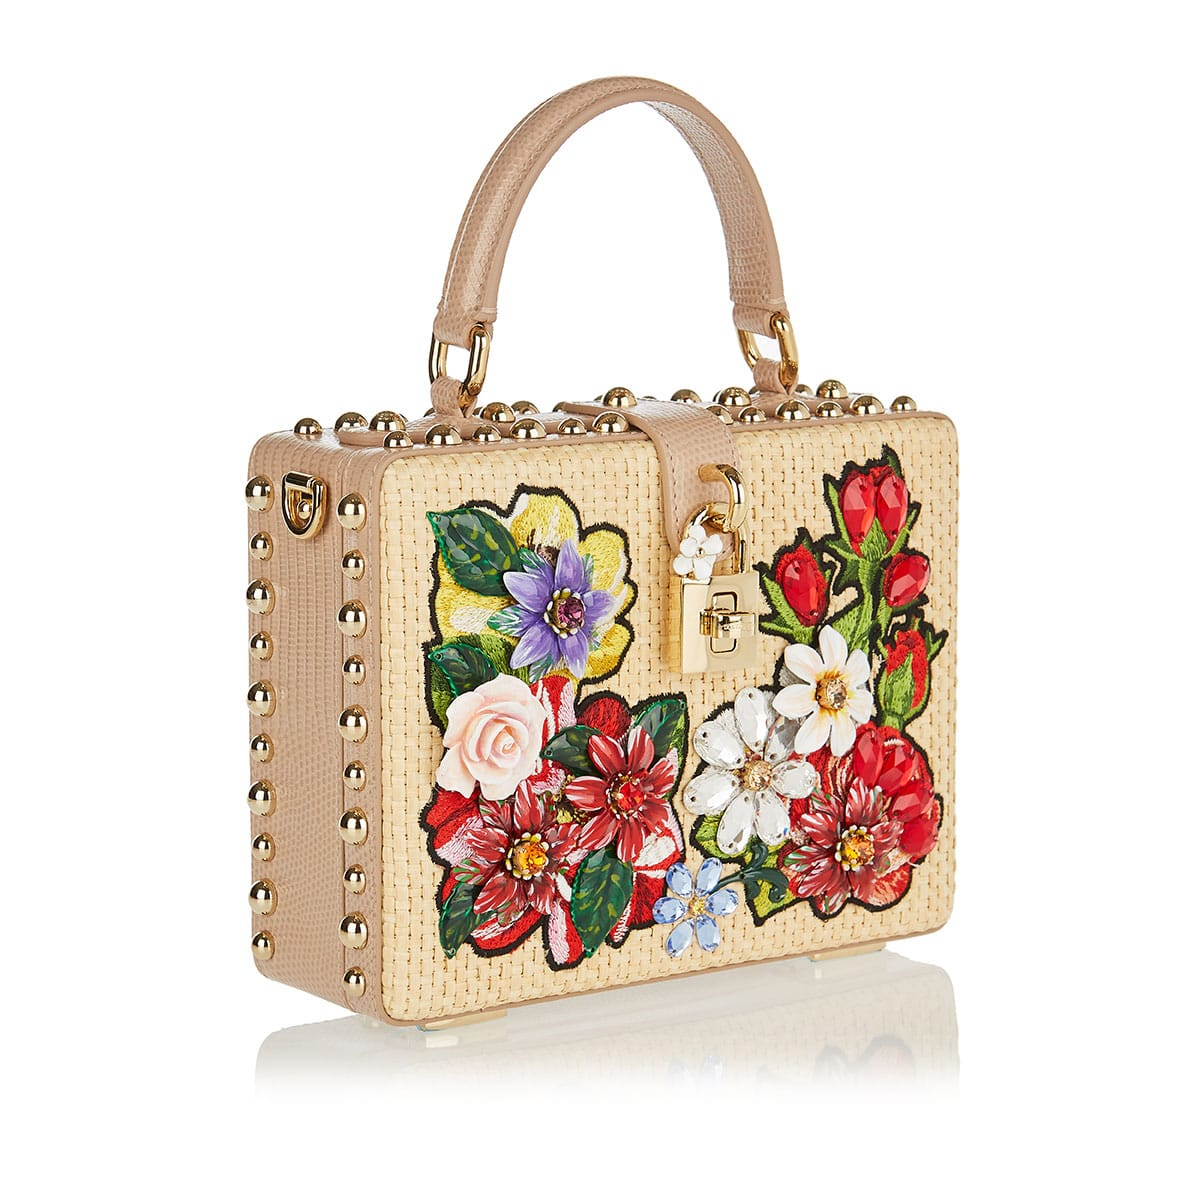 Dolce Box embellished woven bag